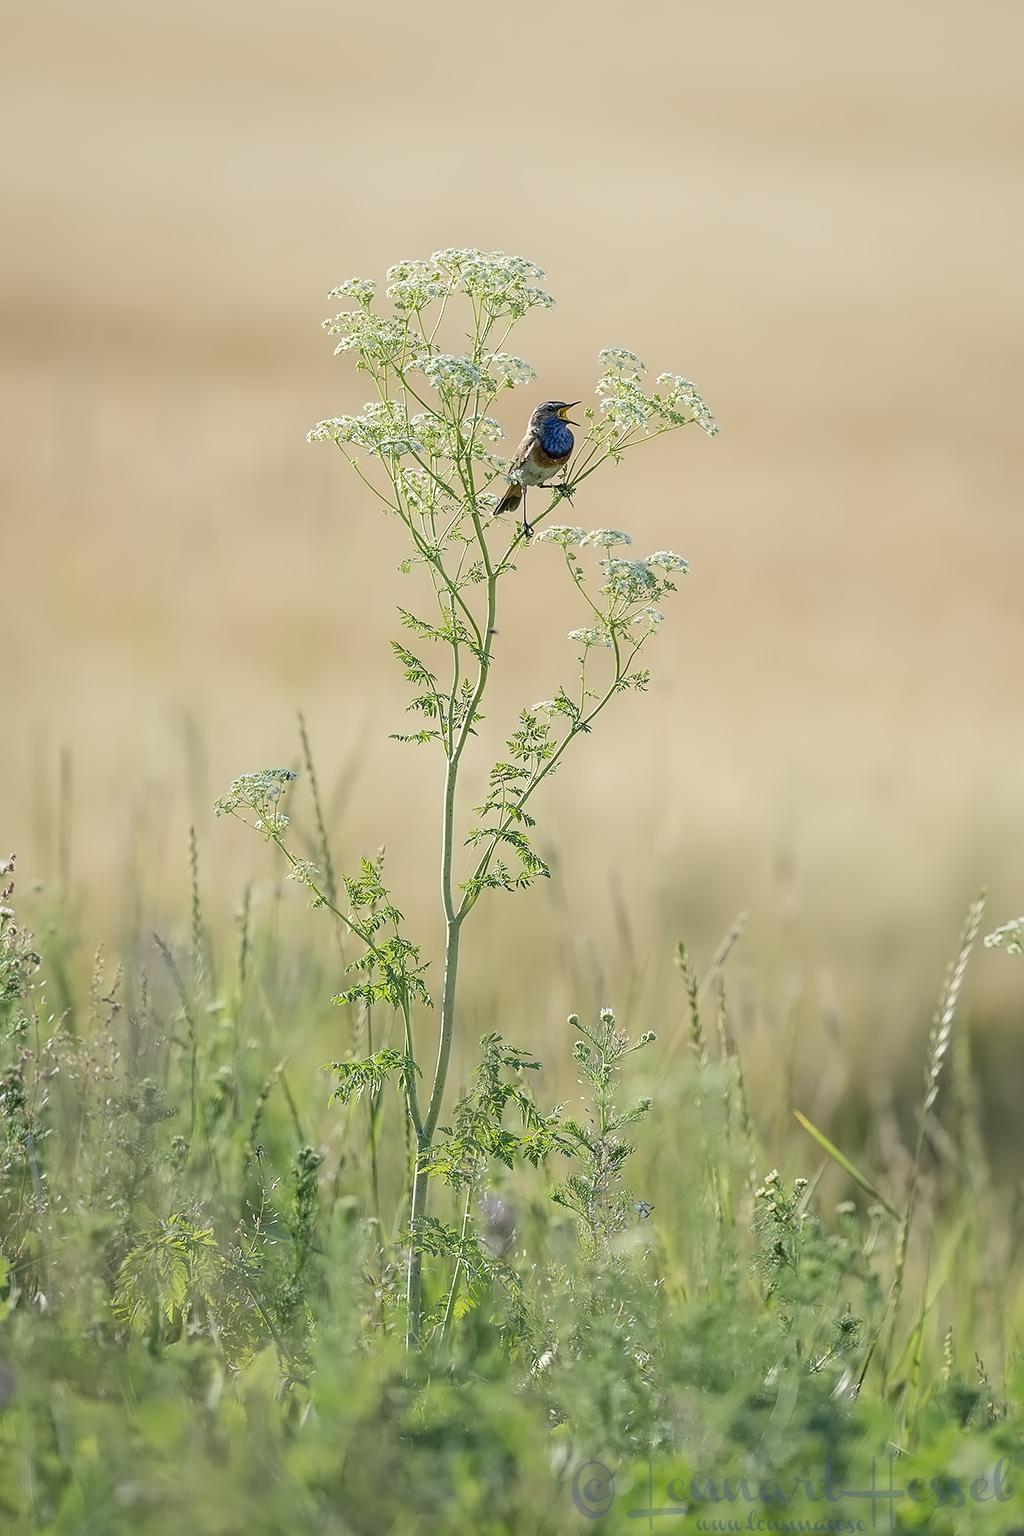 Bluethroat singing Hungary Bee-eater